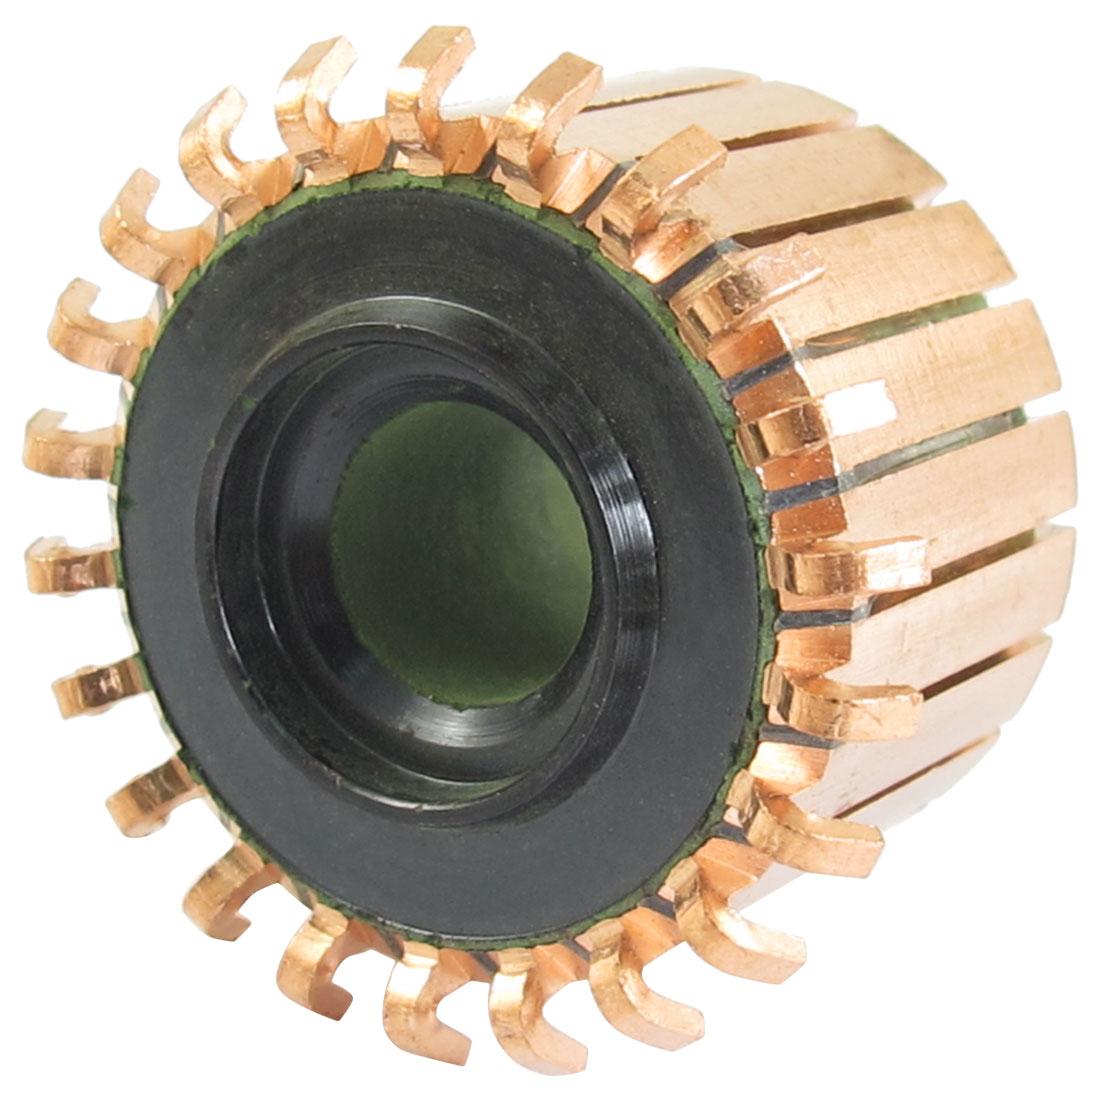 8mm x 23.4mm x 17.5mm 22P Copper Bars Armature Commutator for Starter Motor